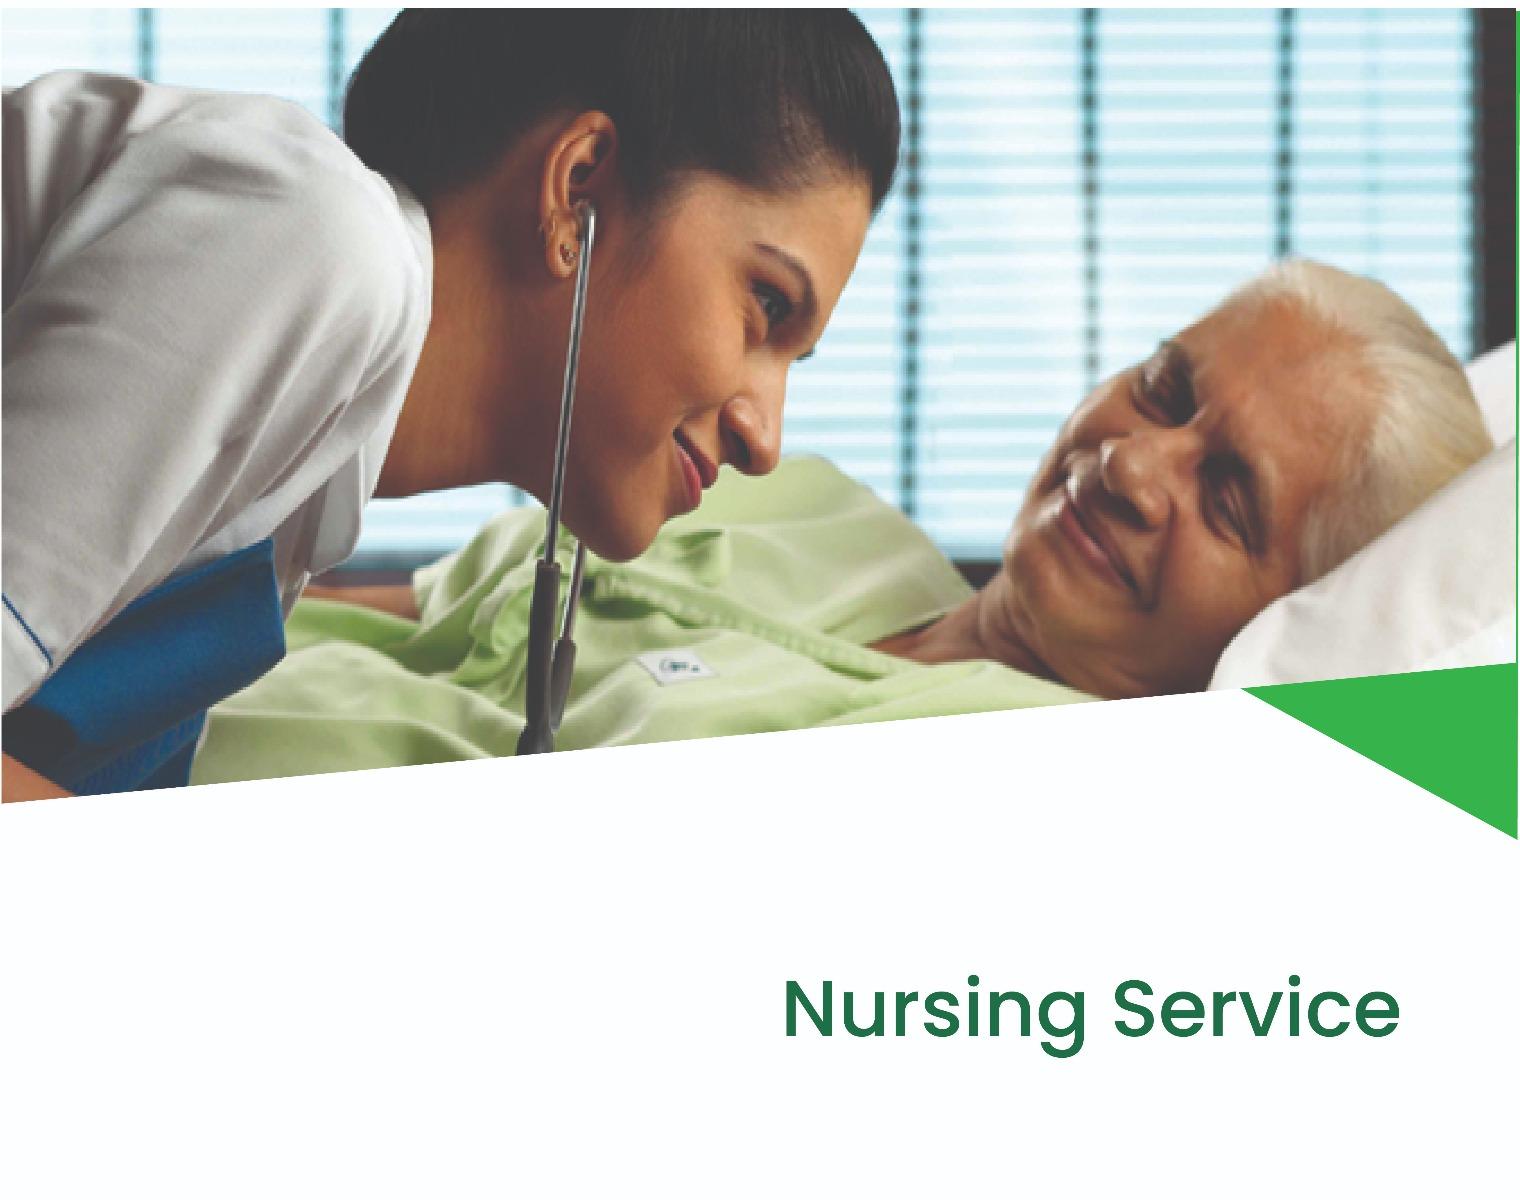 nursing_service